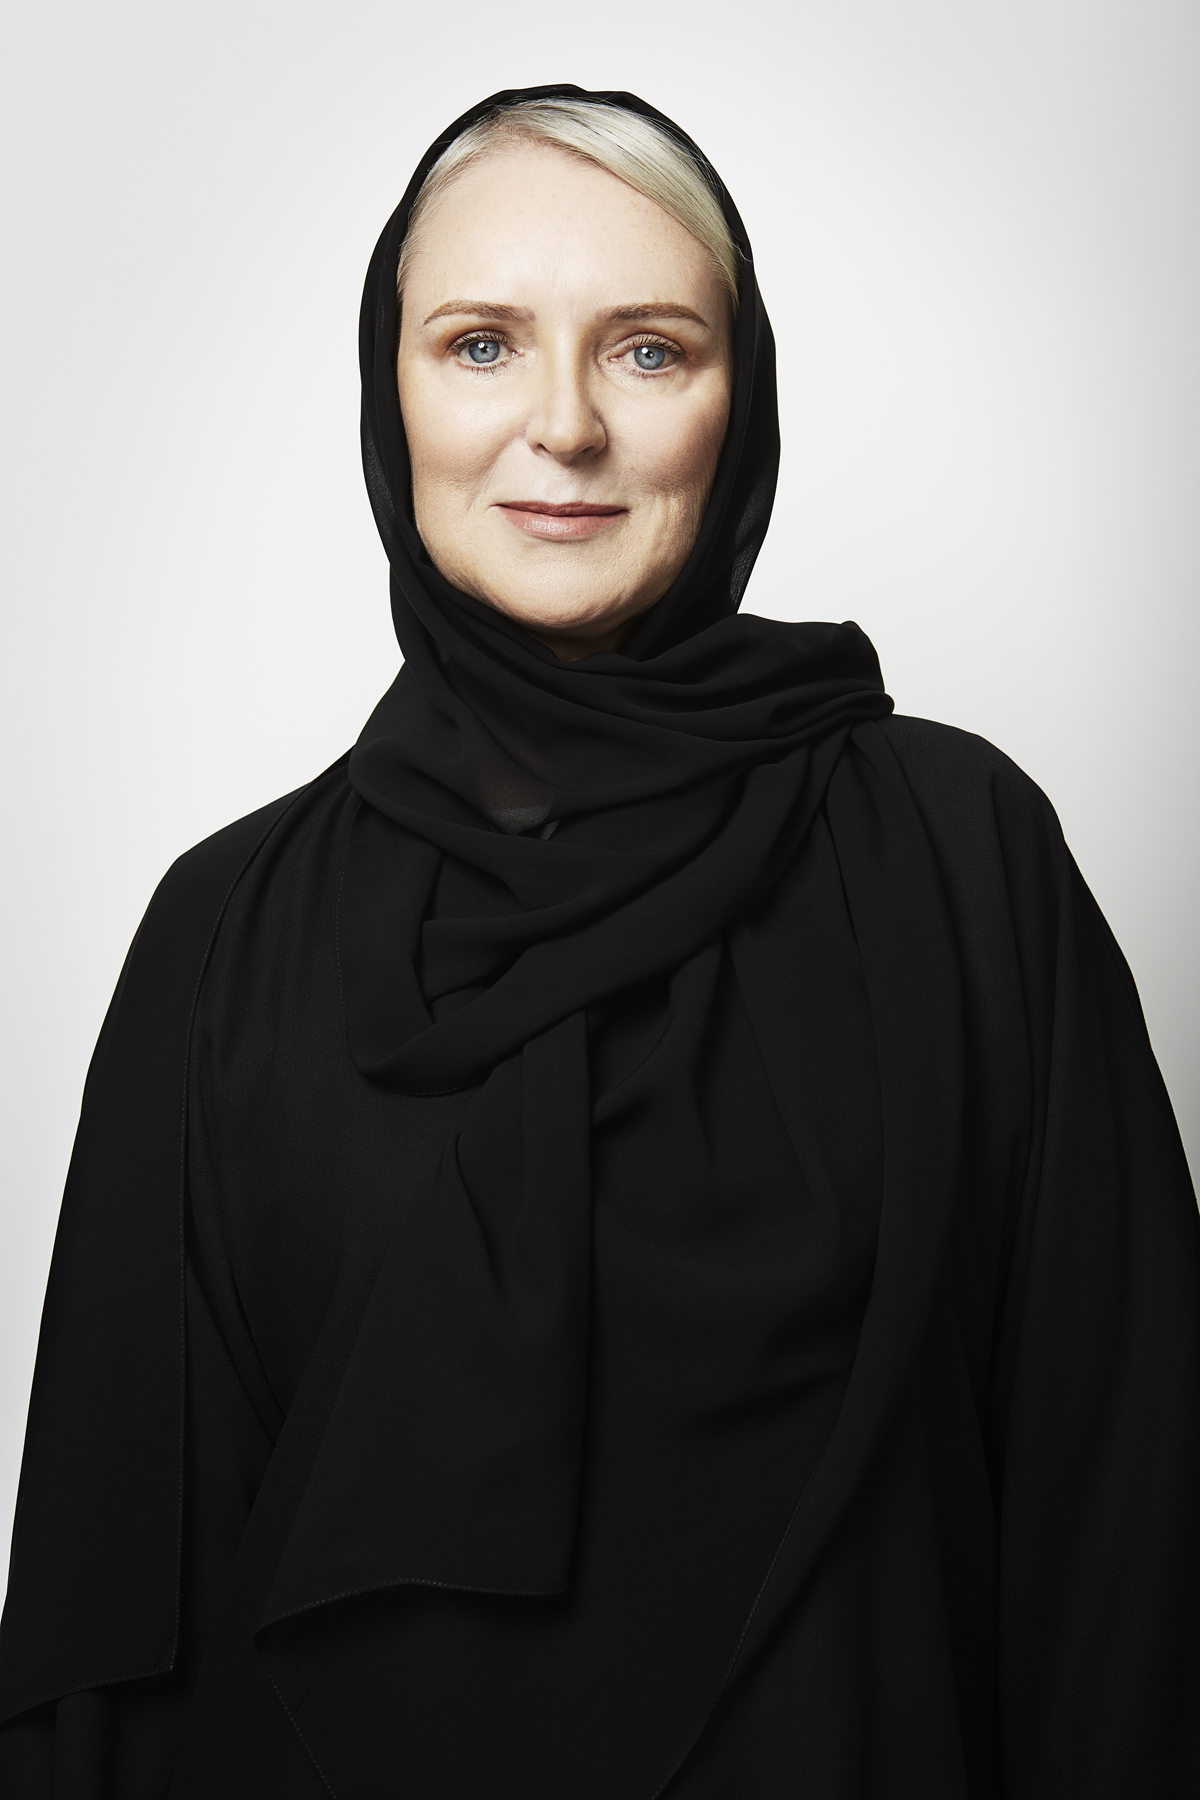 RanaldMackechnie.ADNOC Emirati Women's Day12.jpg